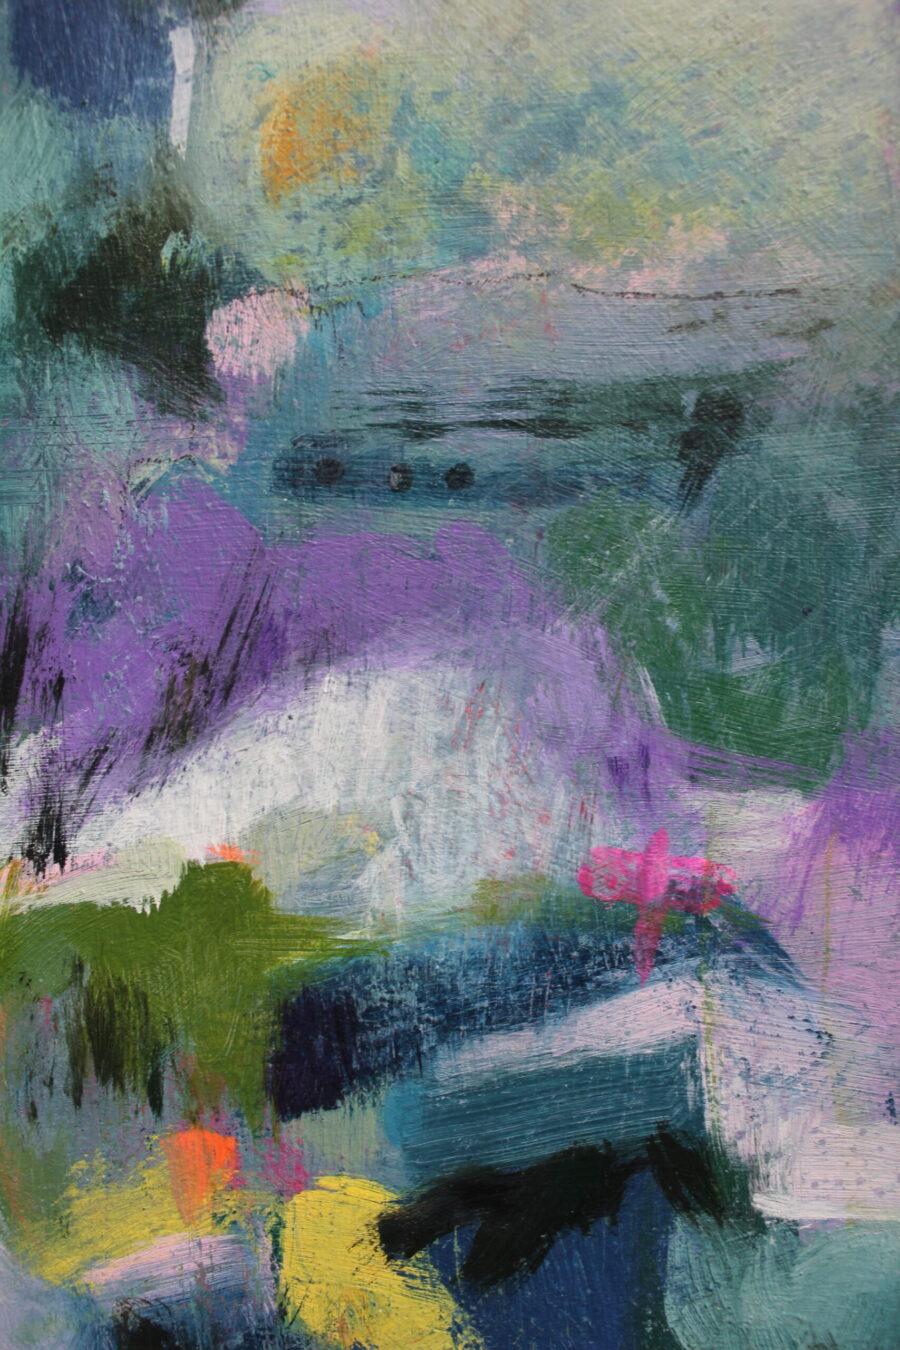 Affordable original abstract art